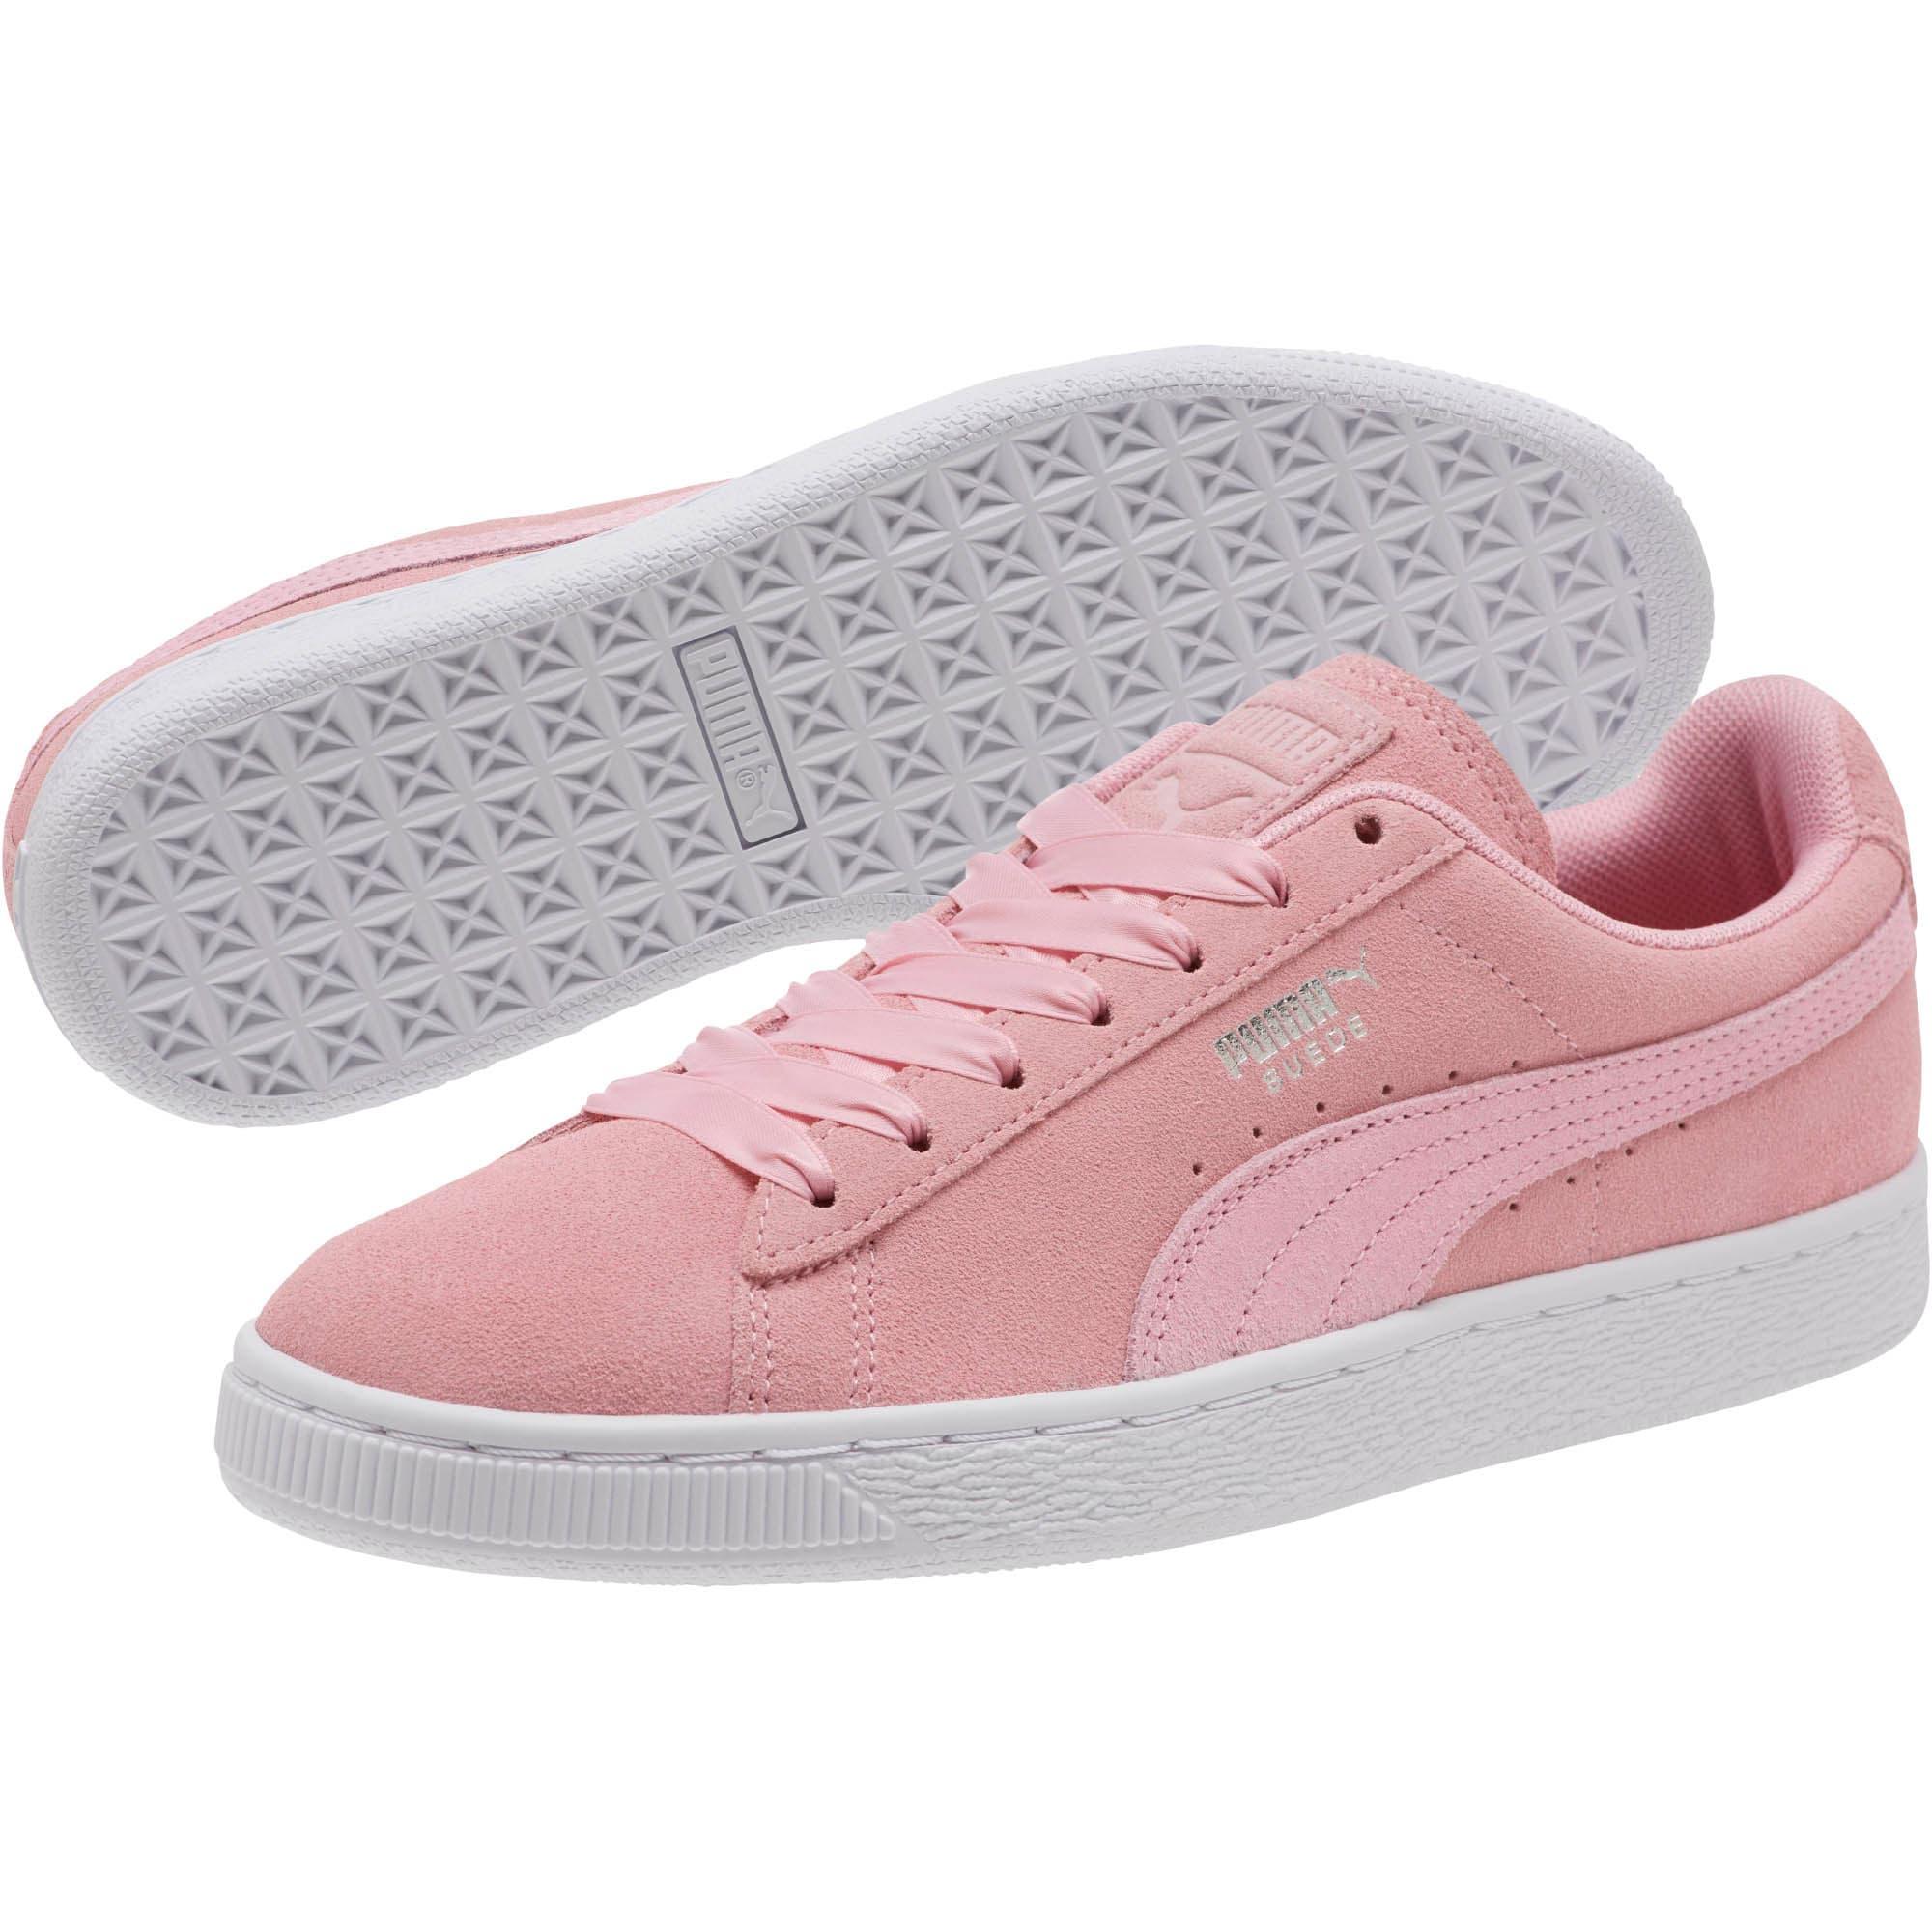 new style ef5fe e3b76 Suede Galaxy Women's Sneakers